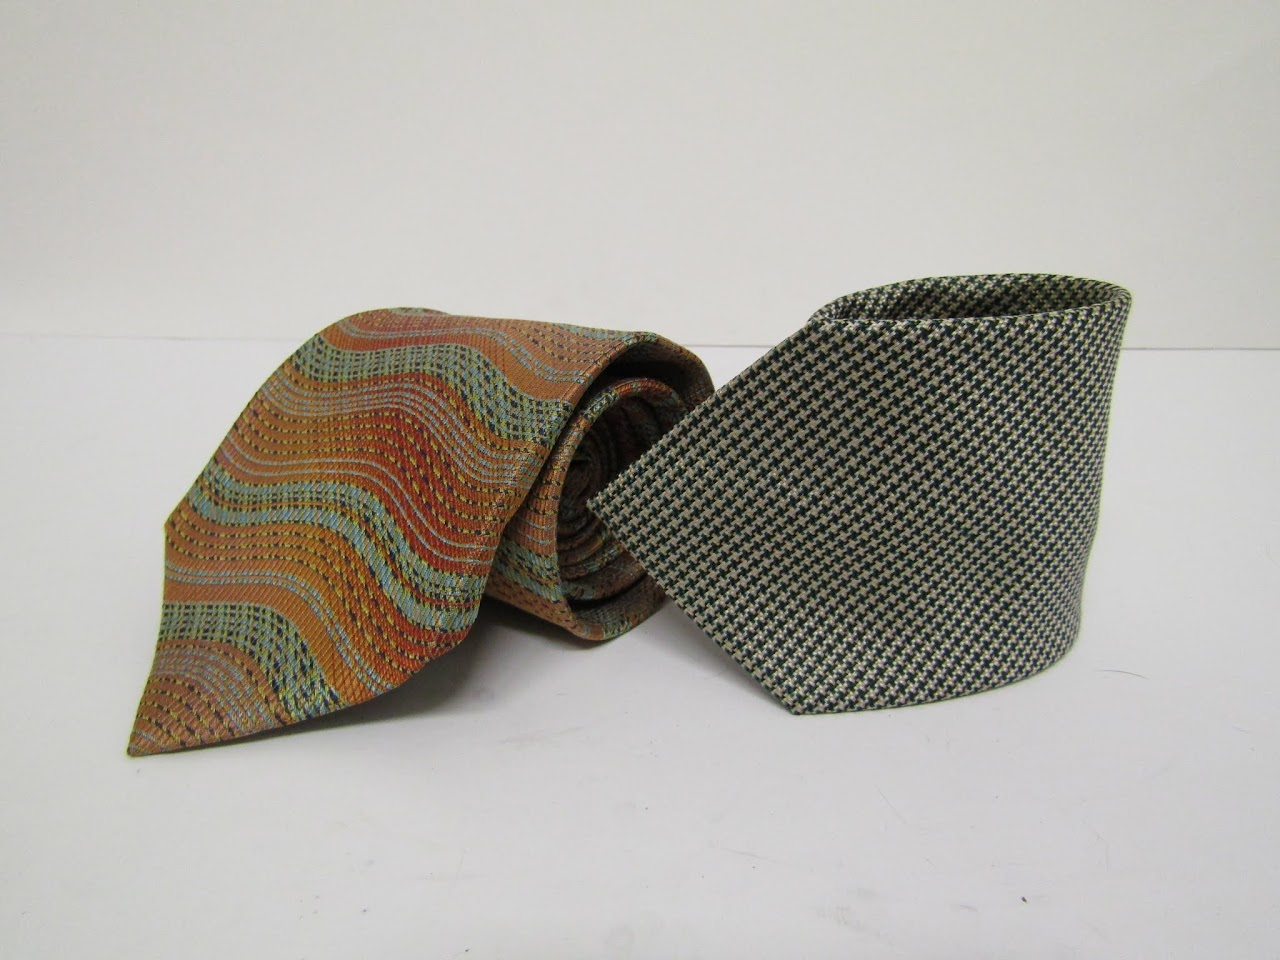 Missoni & Versace Tie Pair